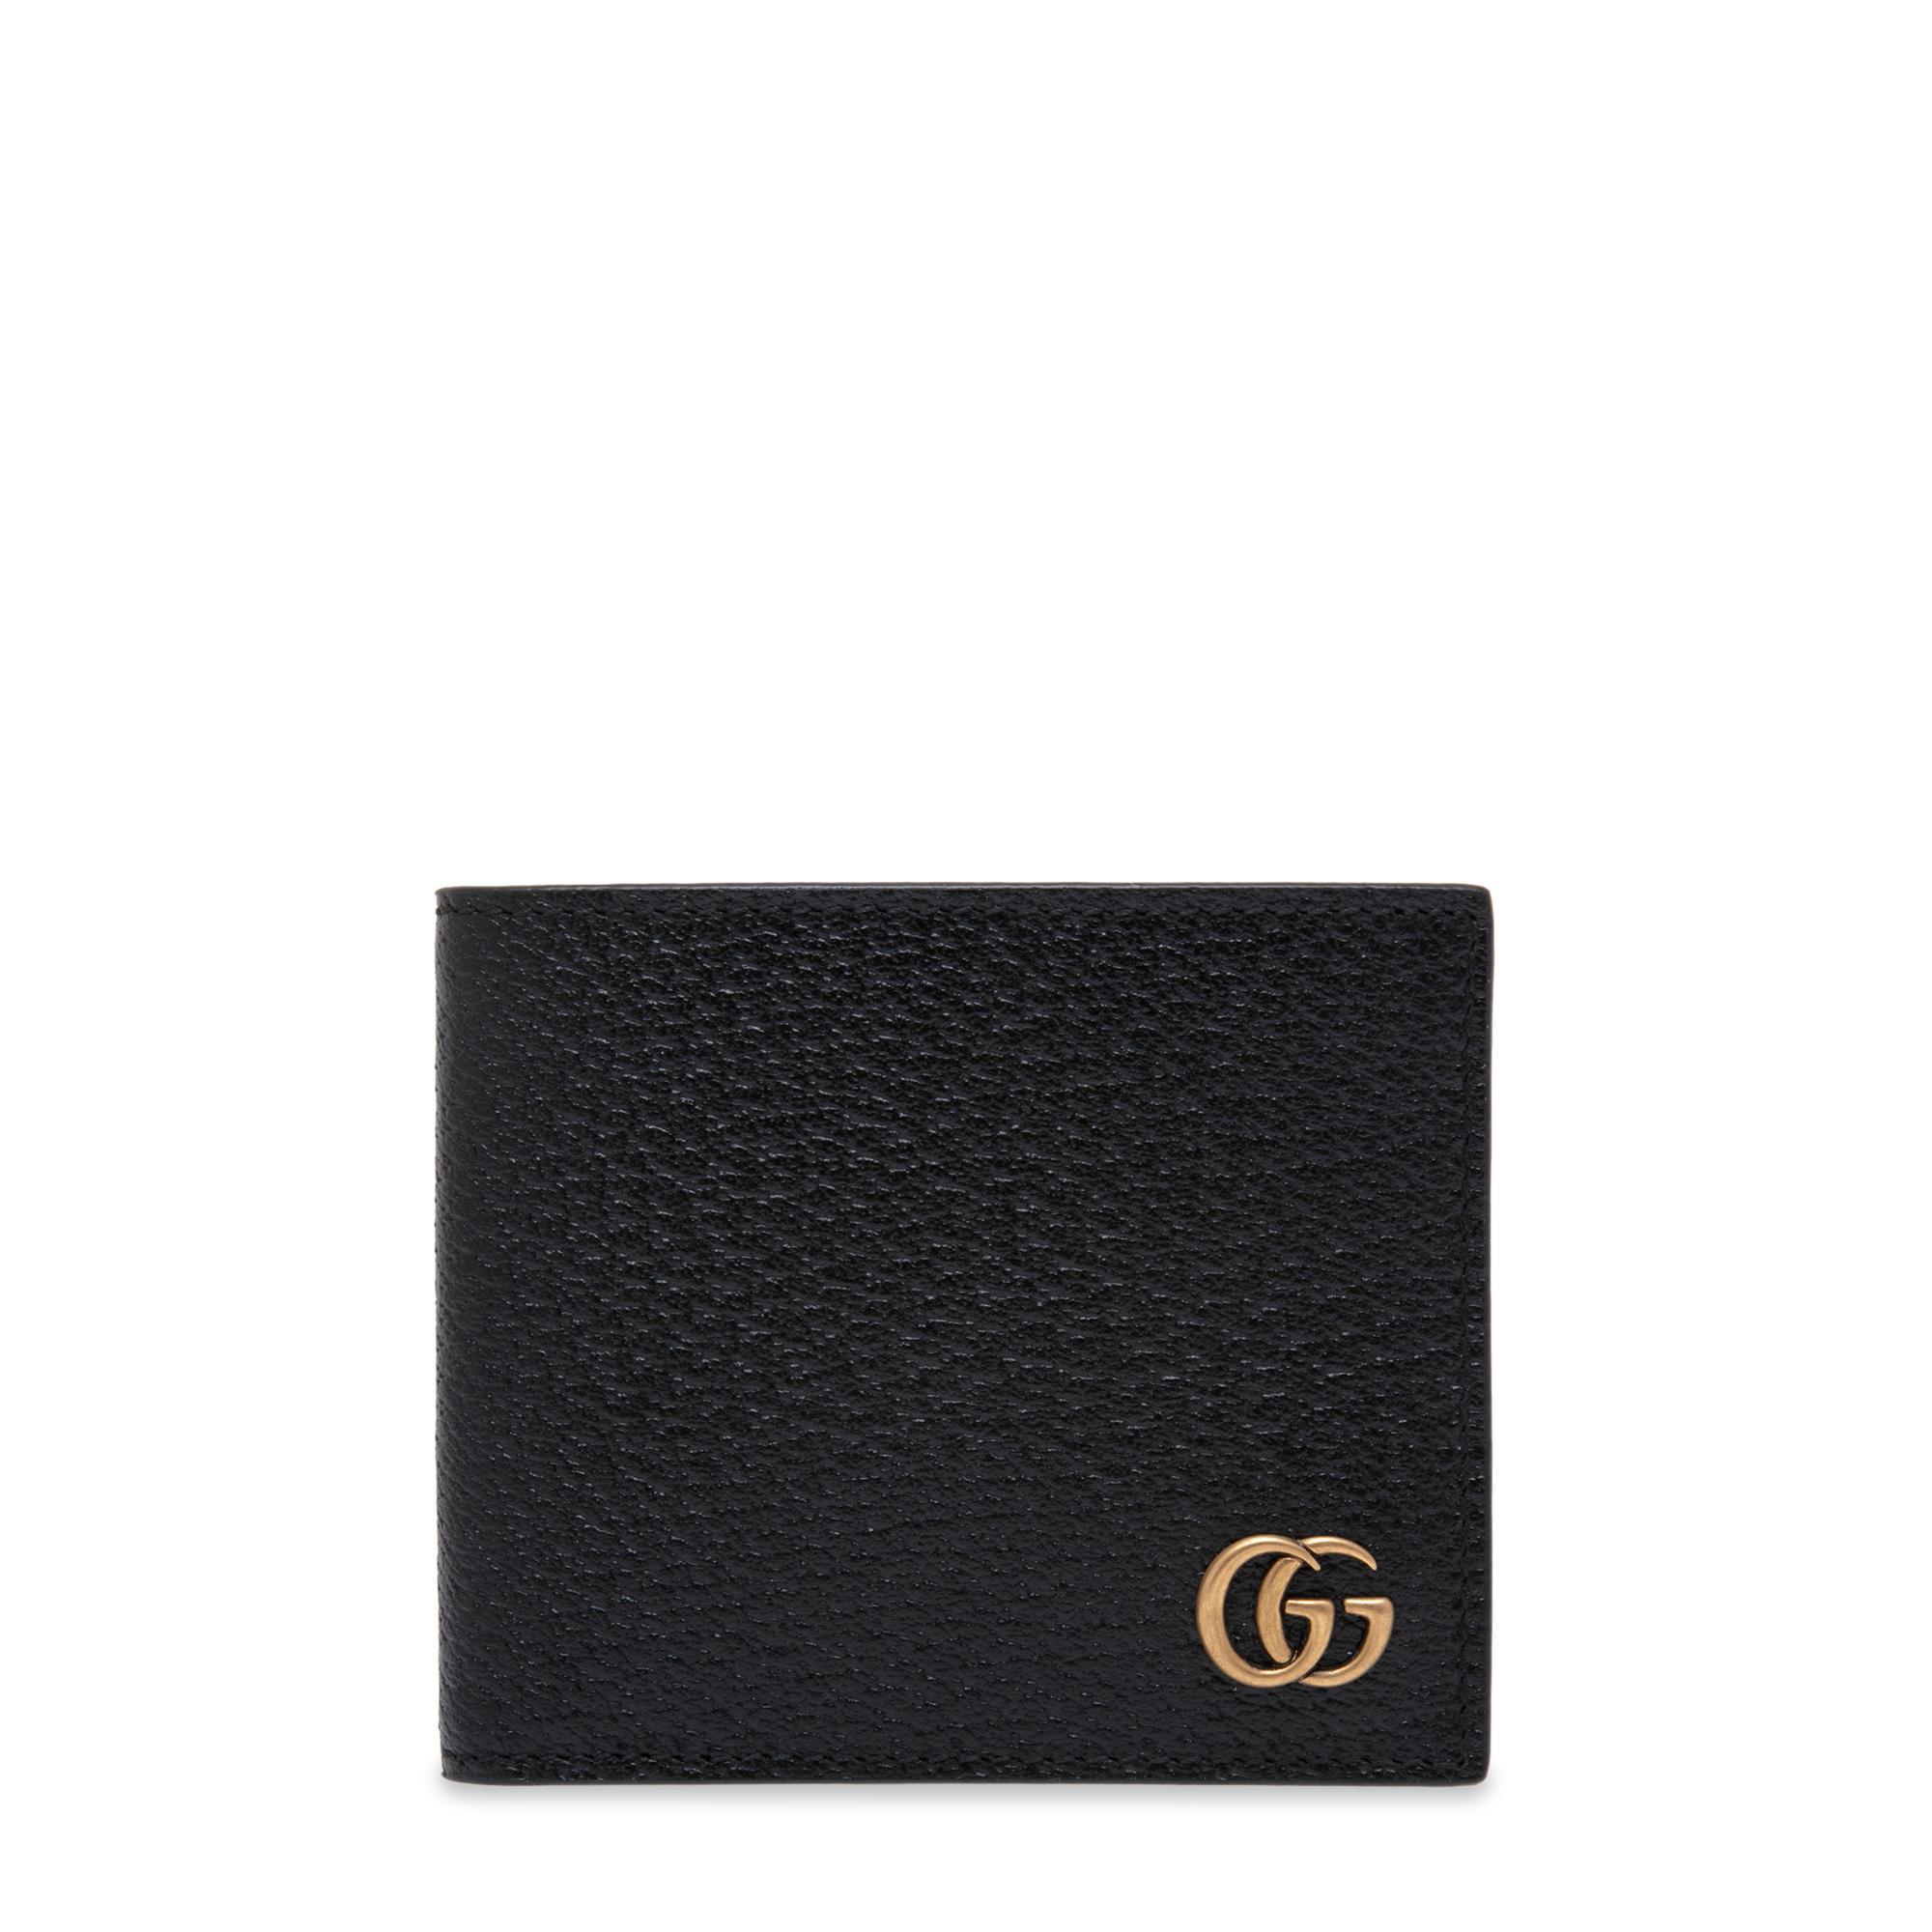 GG Marmont leather bi-fold wallet